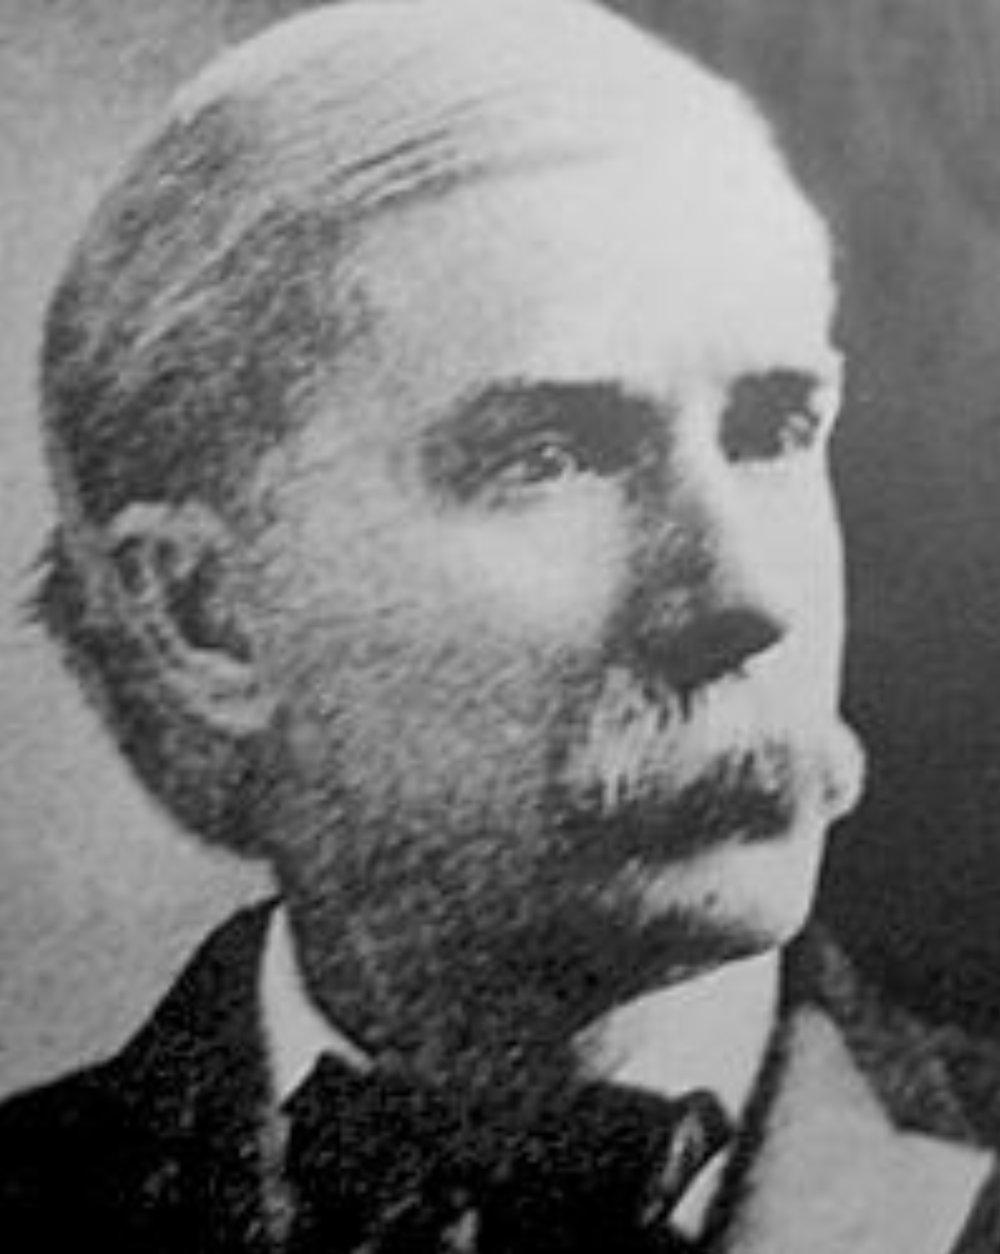 JAMES M. GUFFEY